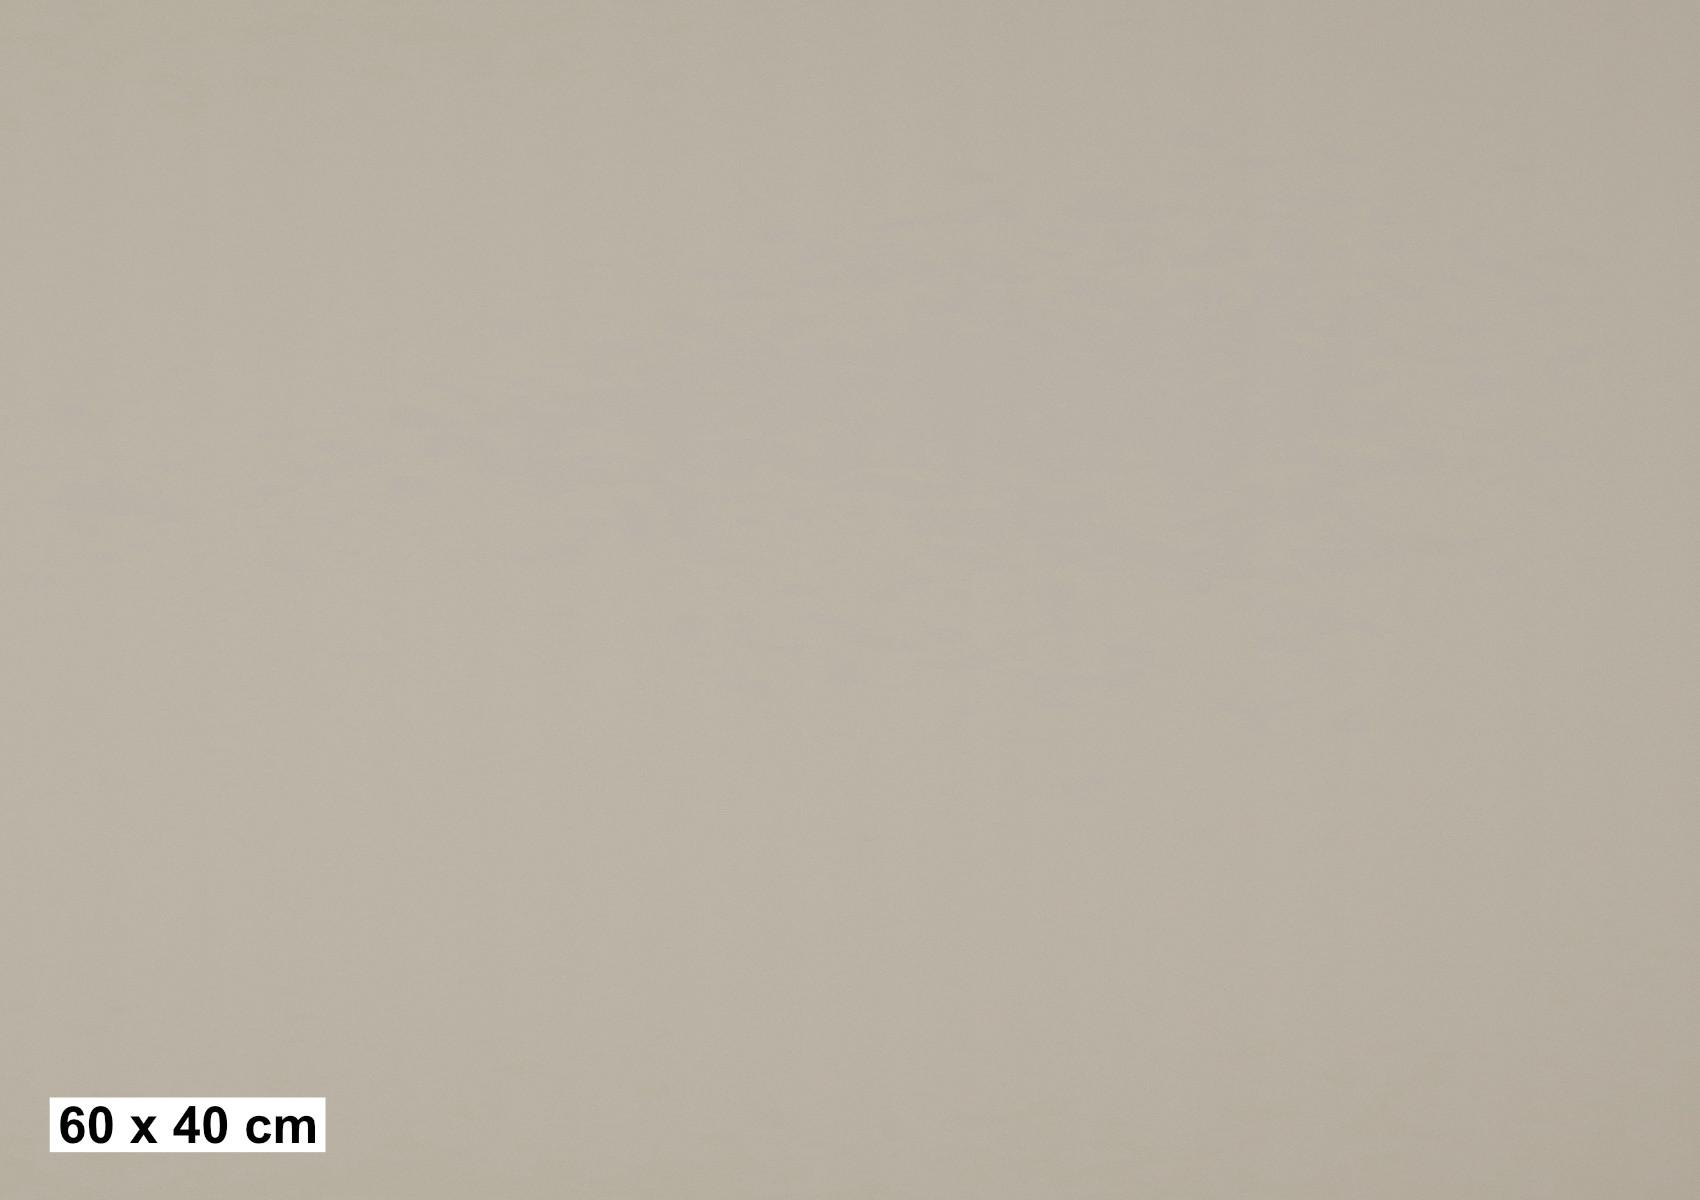 Hellbeige matt / C816-S141